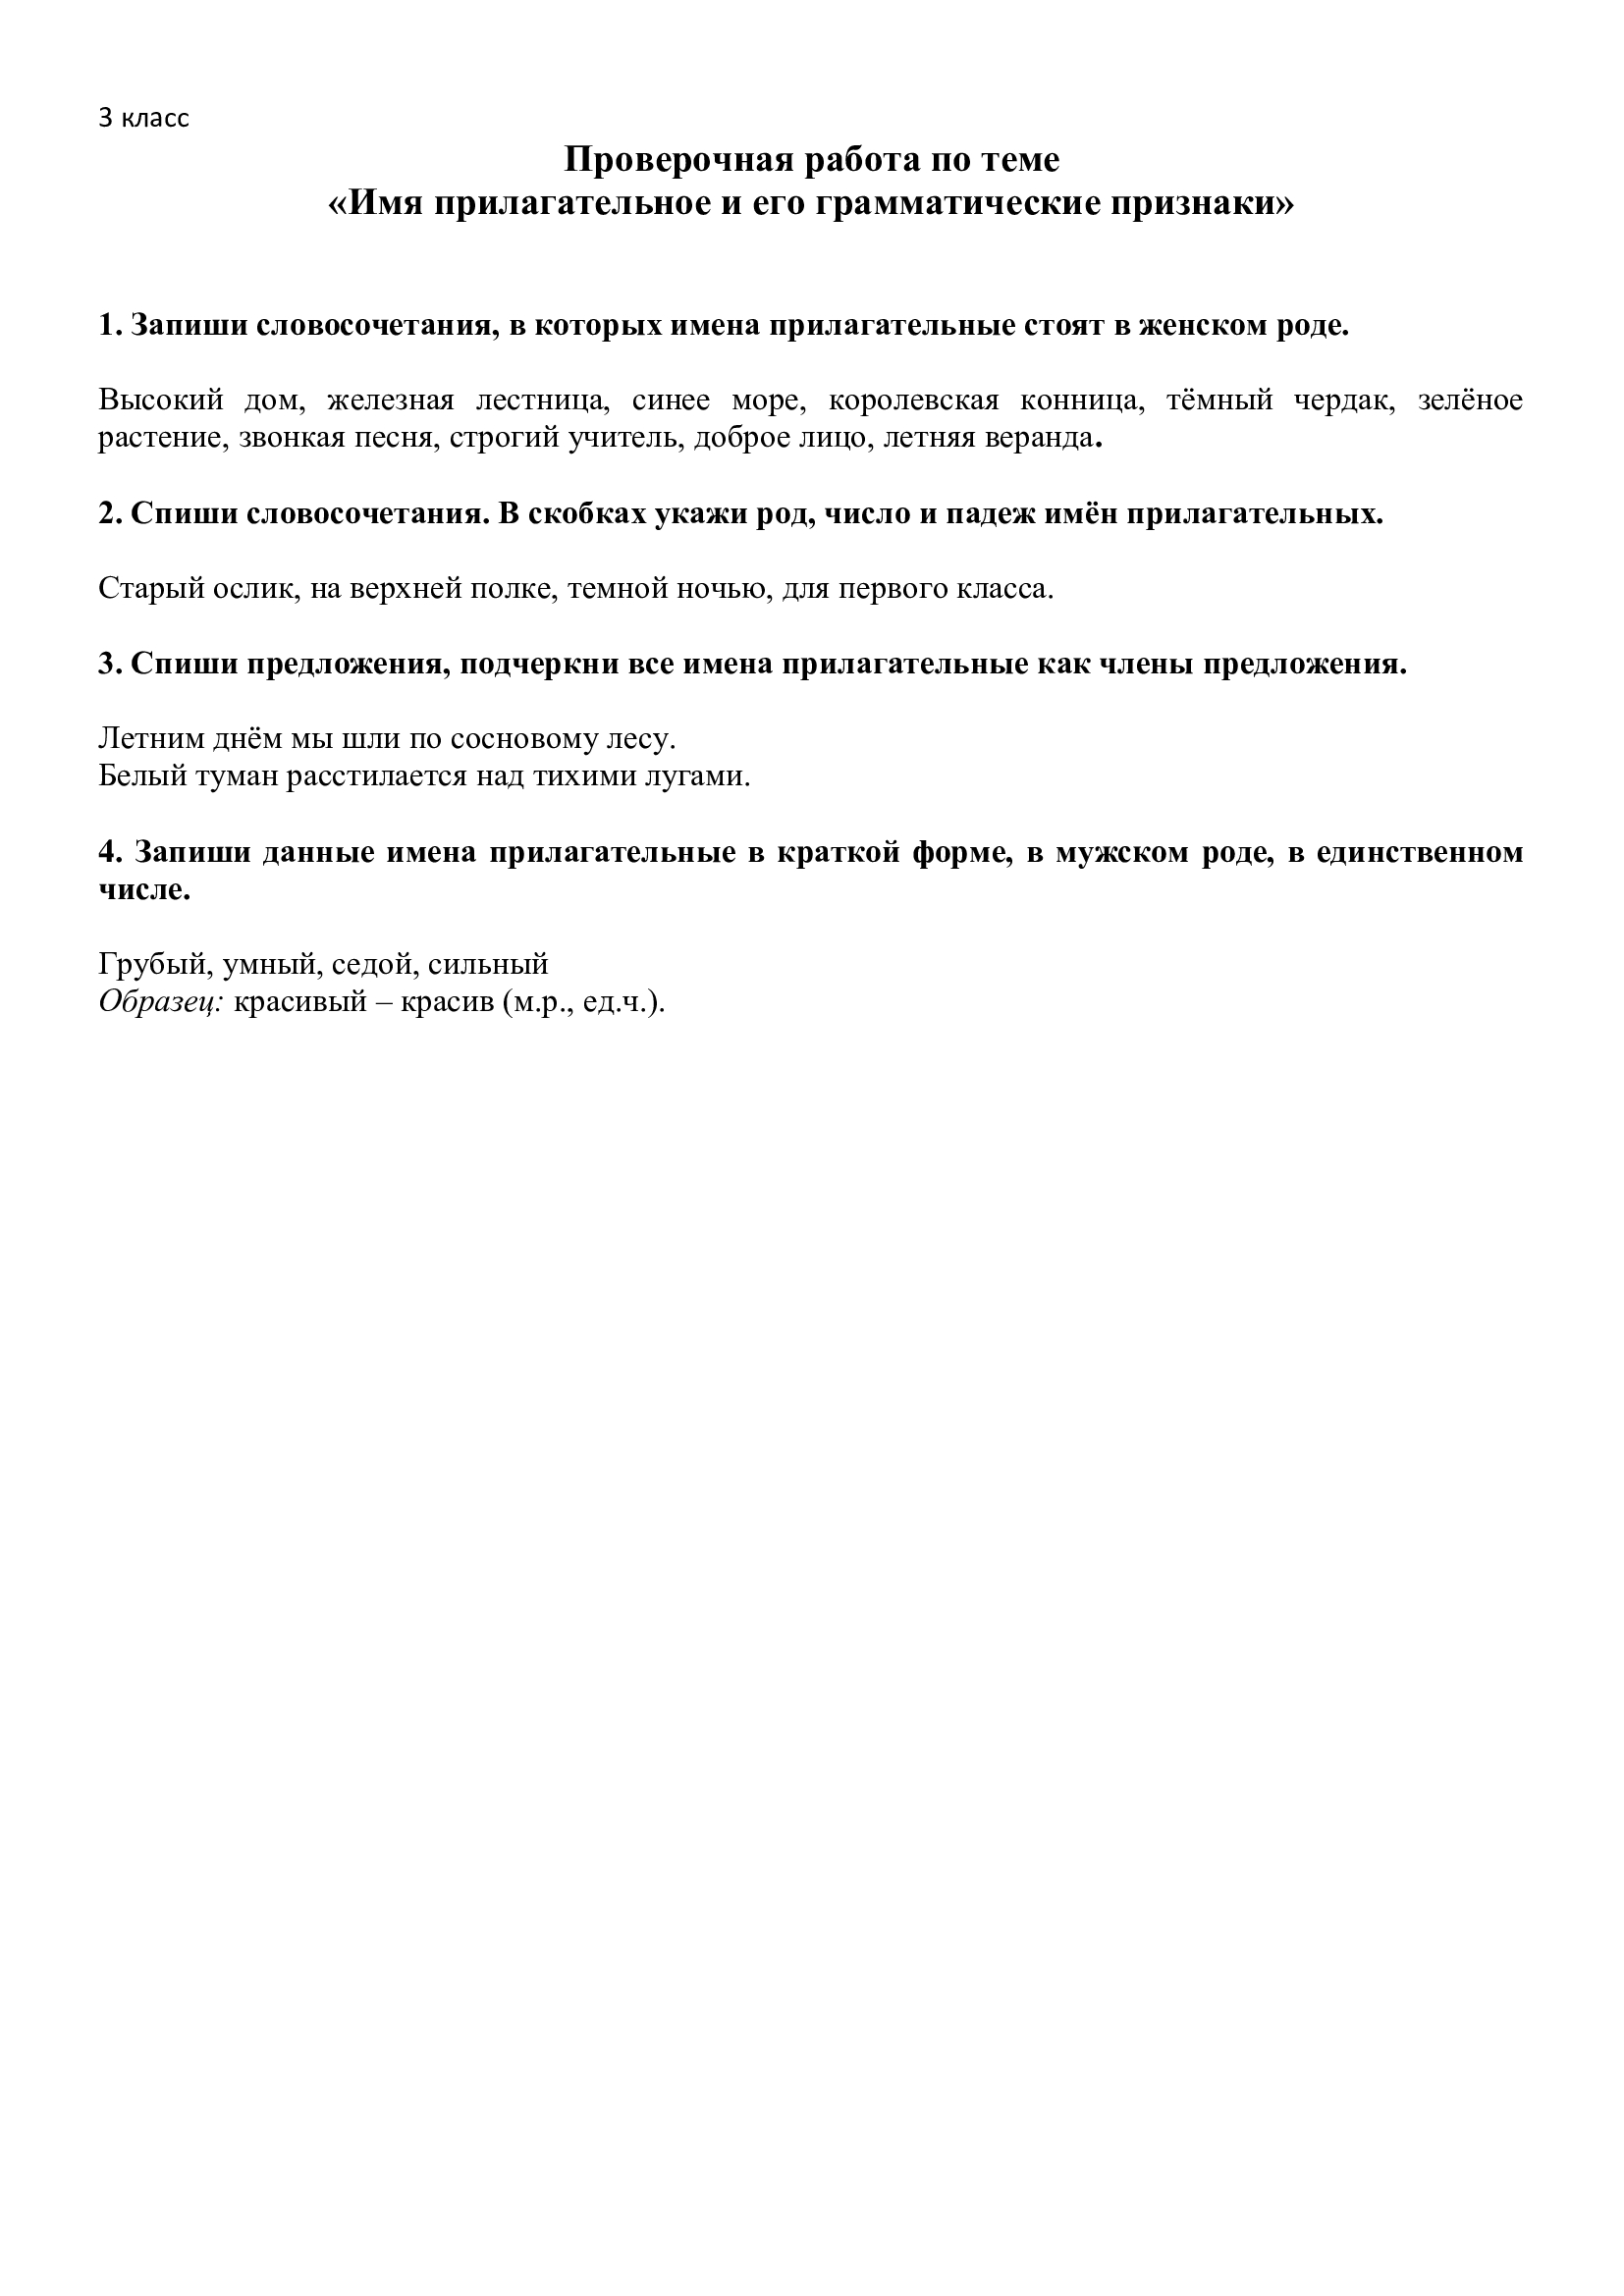 hello_html_5be3b3d2.jpg